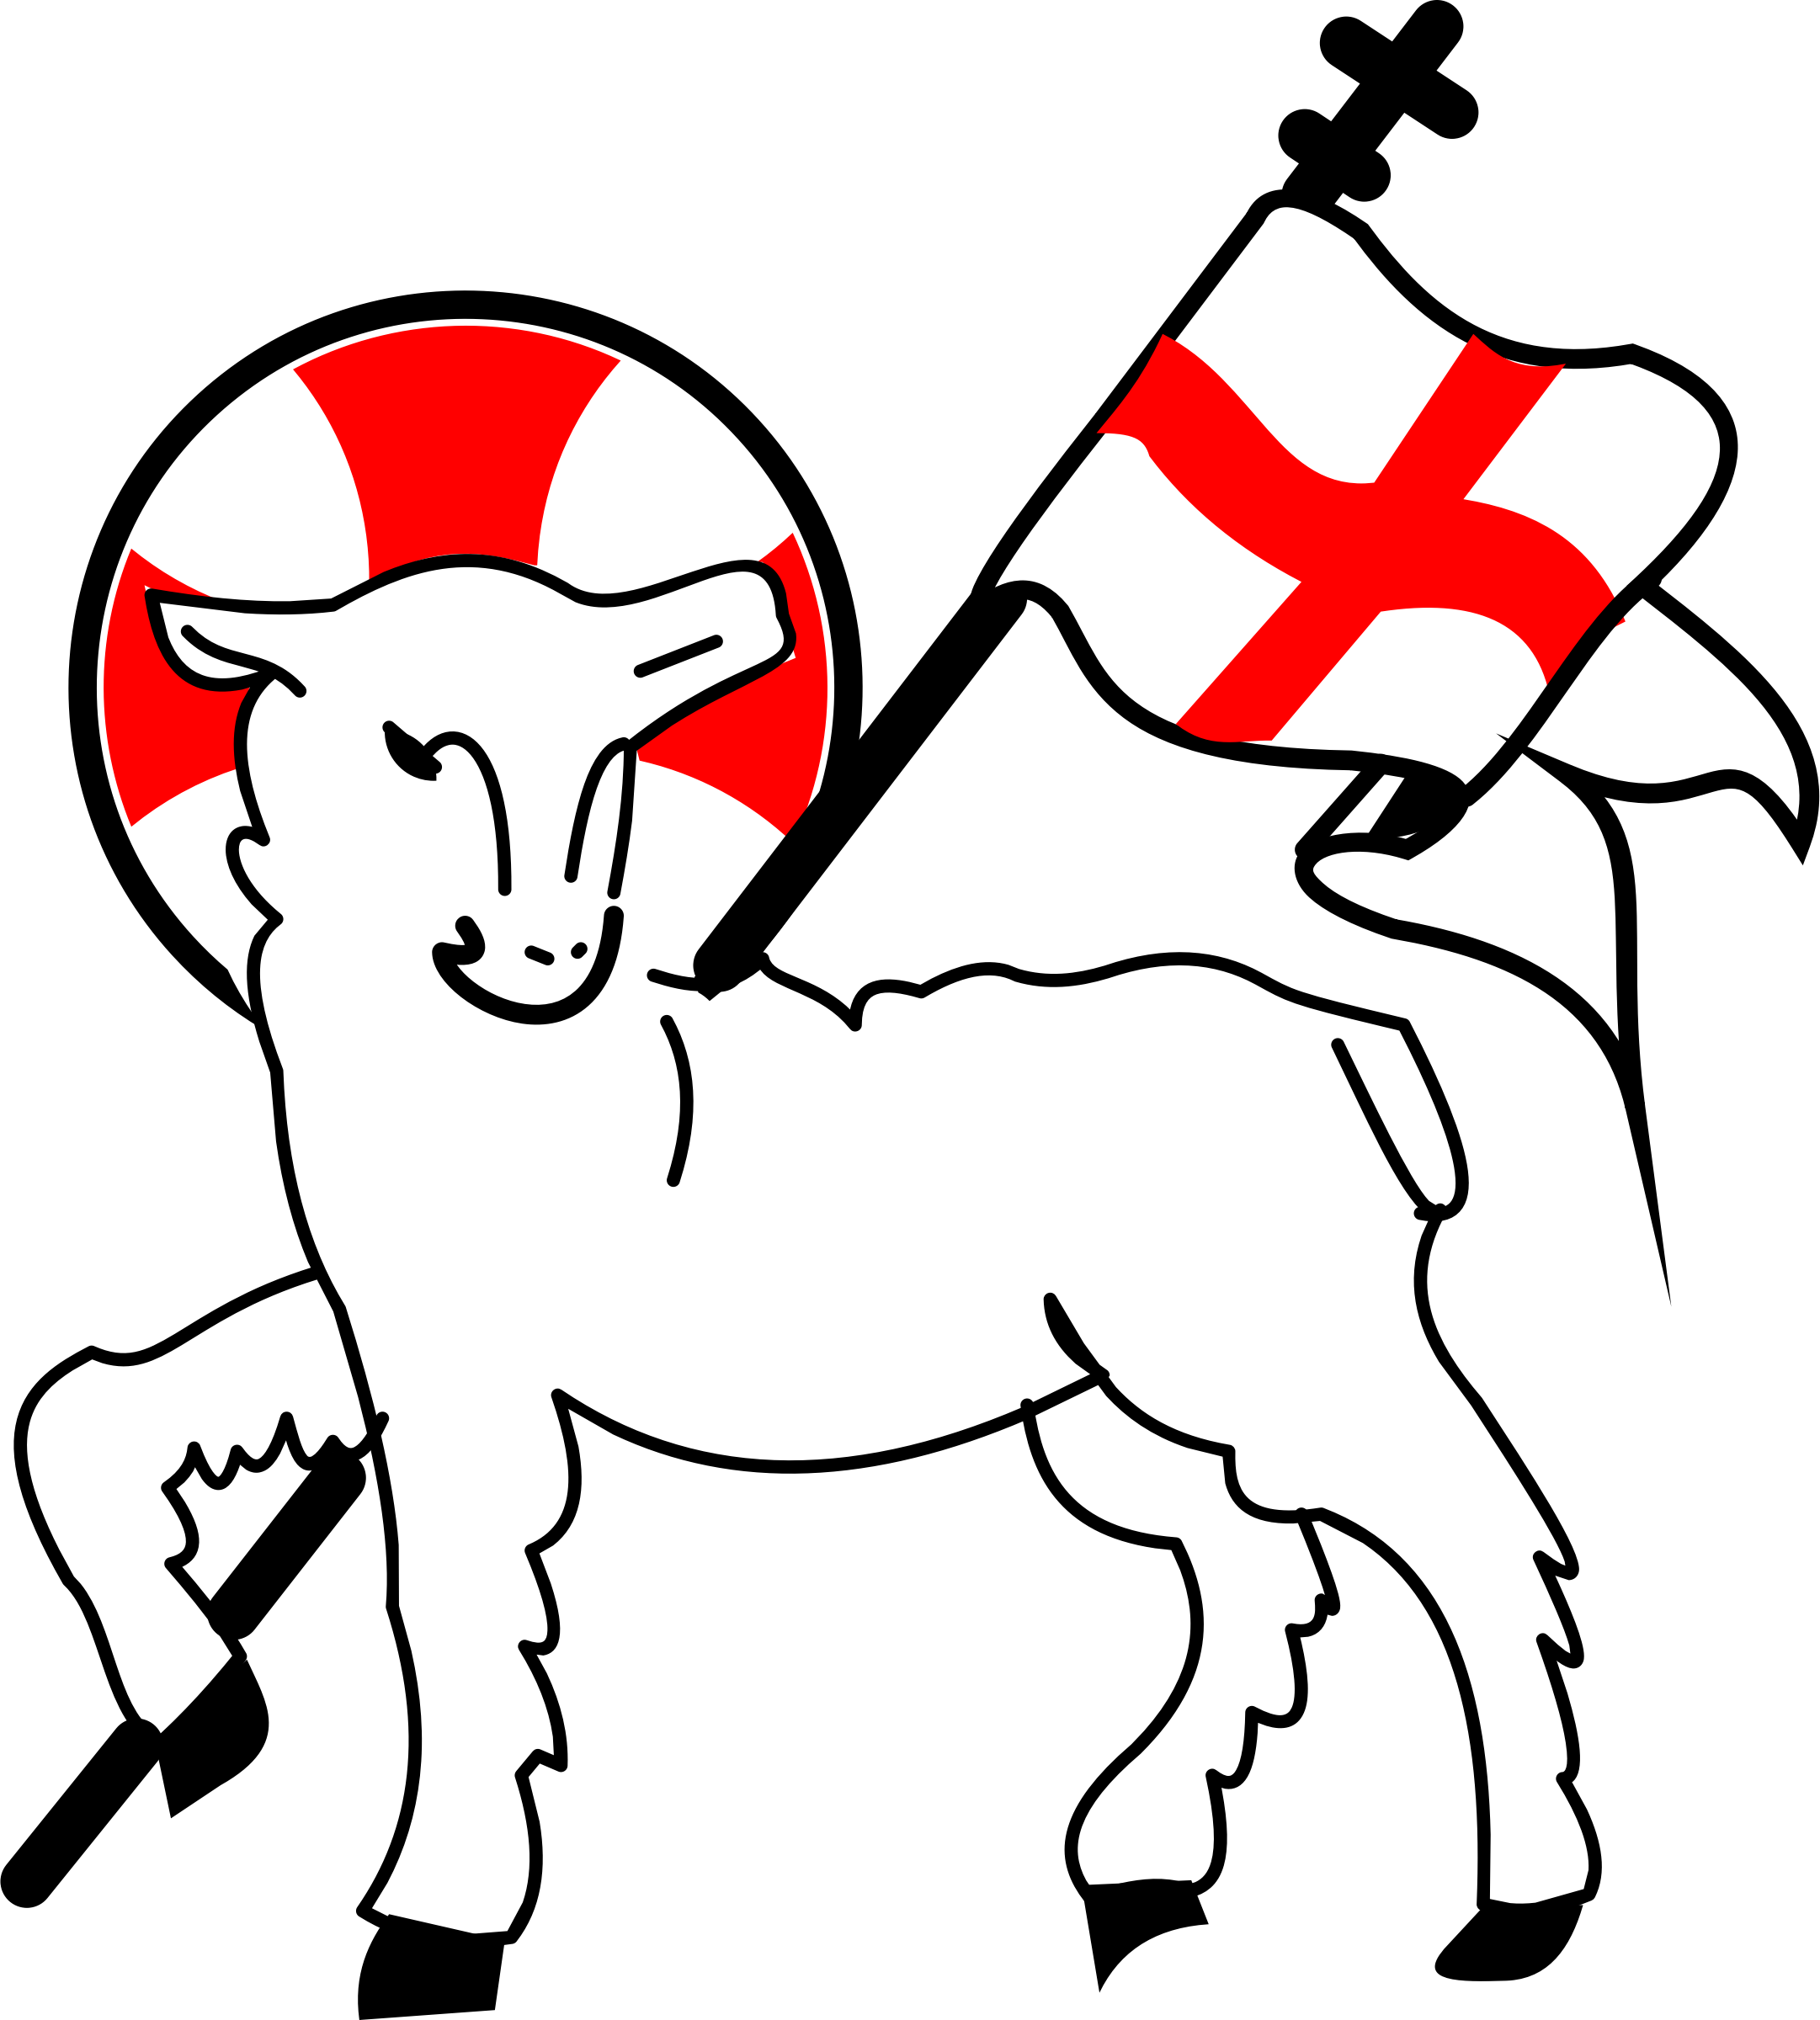 Agnus dei big image. Lamb clipart jesus lamb god